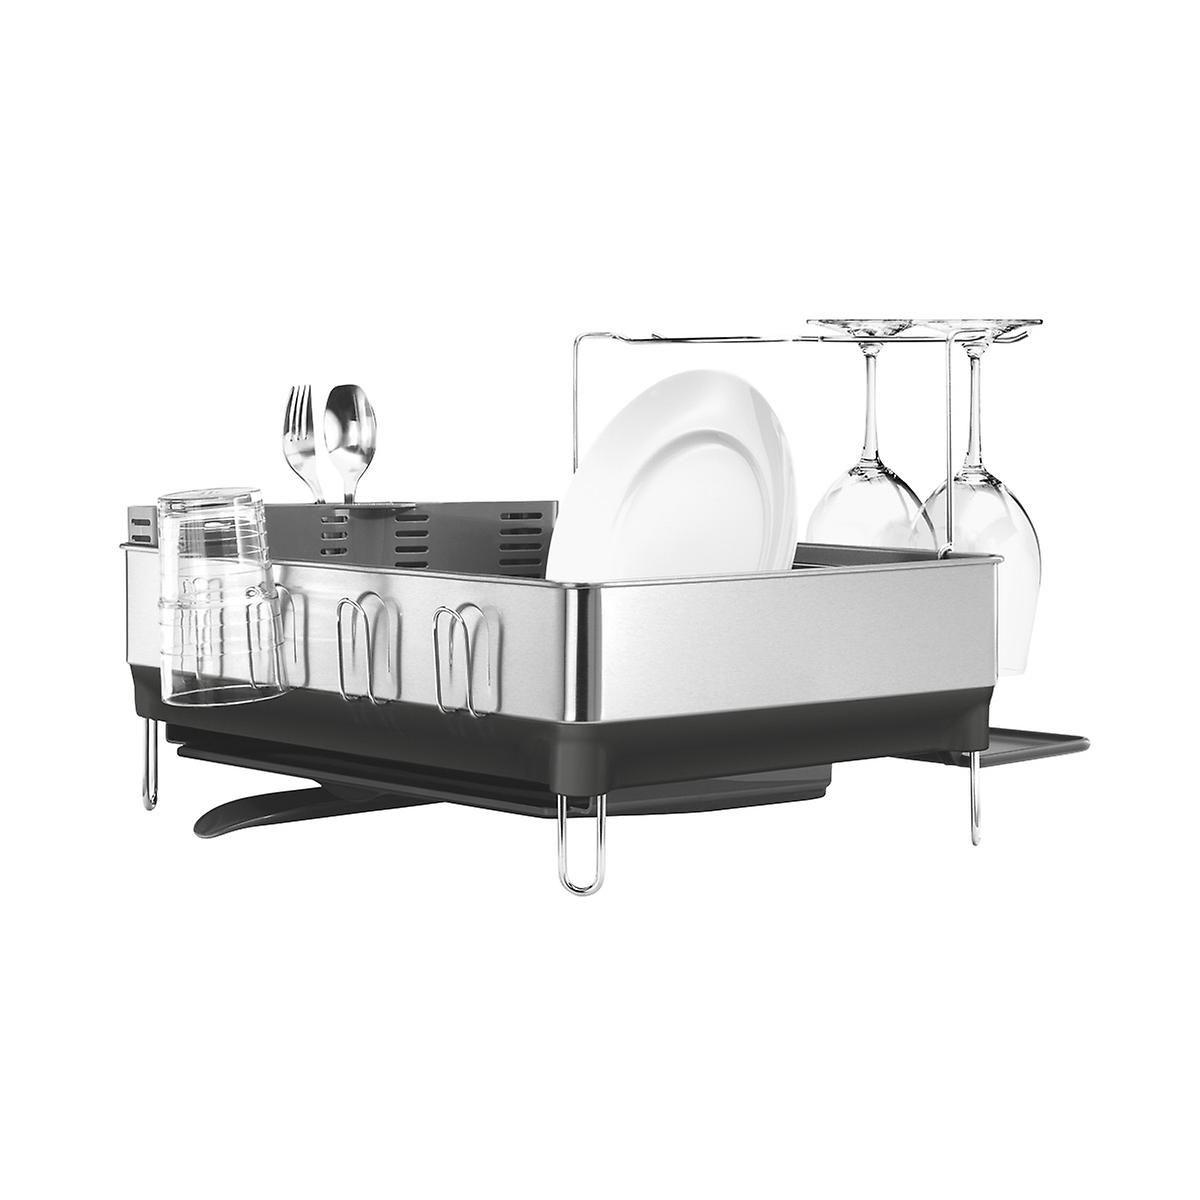 Simplehuman Stainless Steel Frame Dish Rack Wine Glass Holder